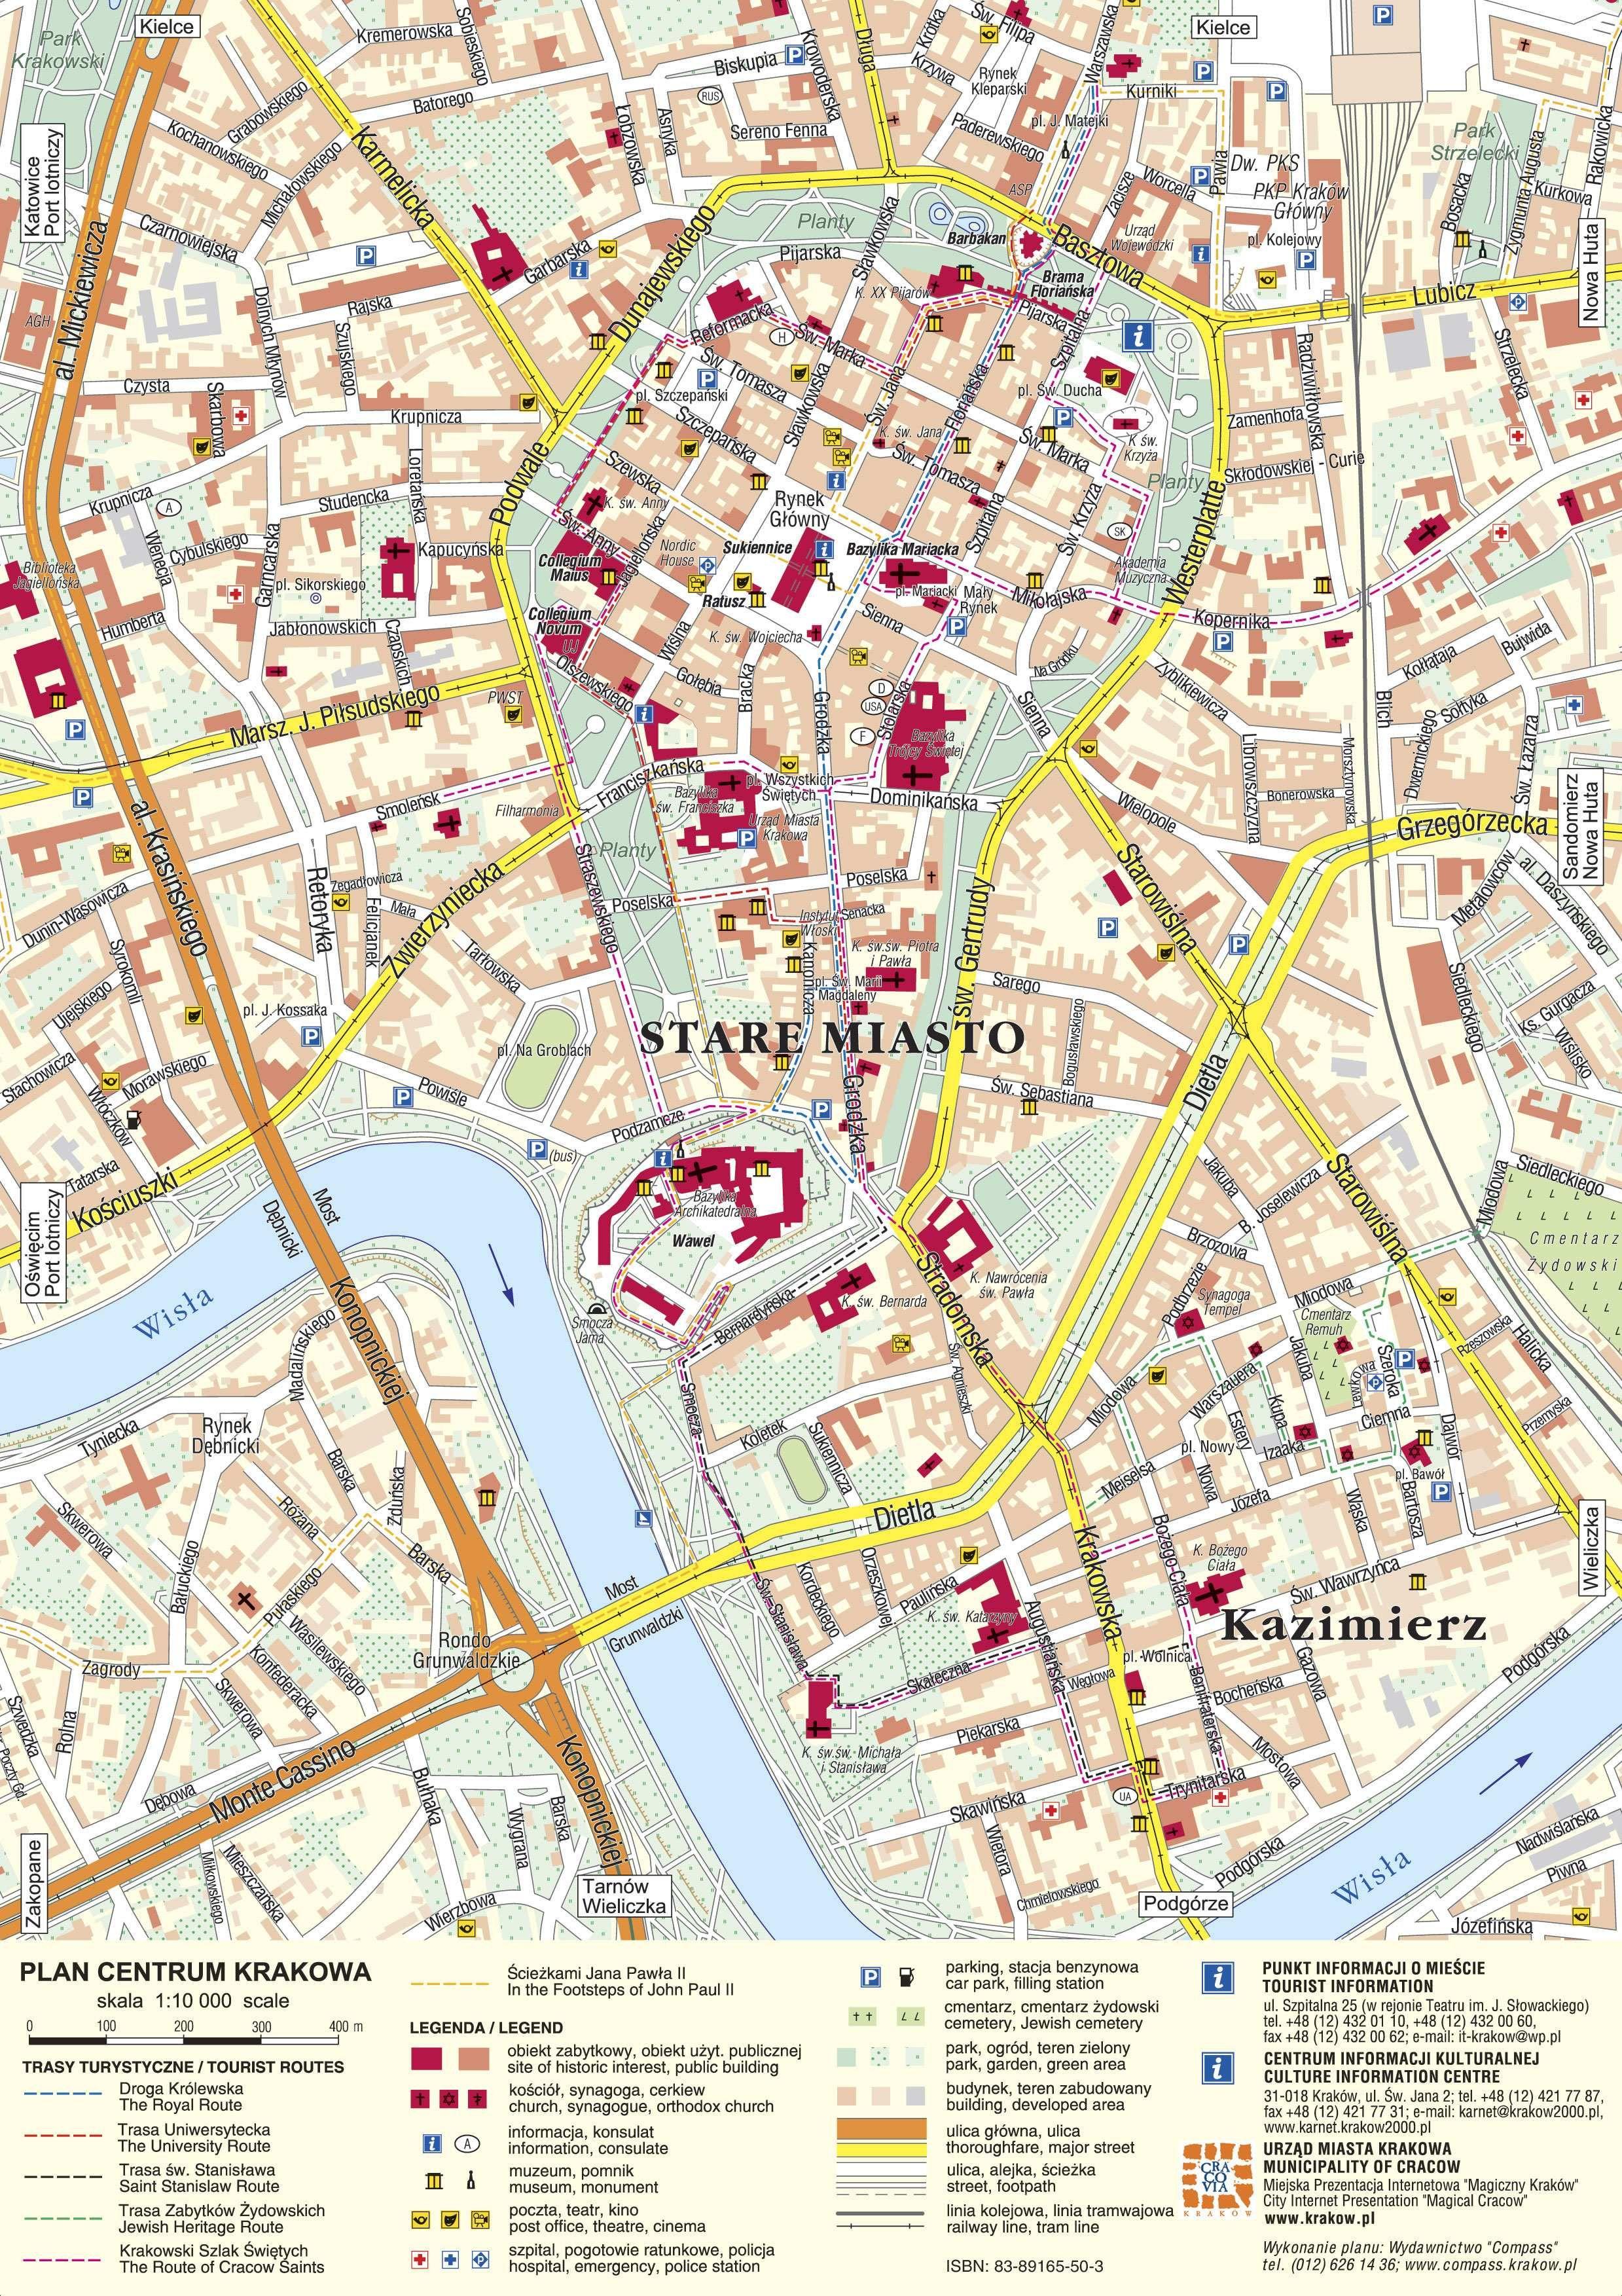 Mapa Turistico De Cracovia Polonia Cracovia Polonia Cracovia